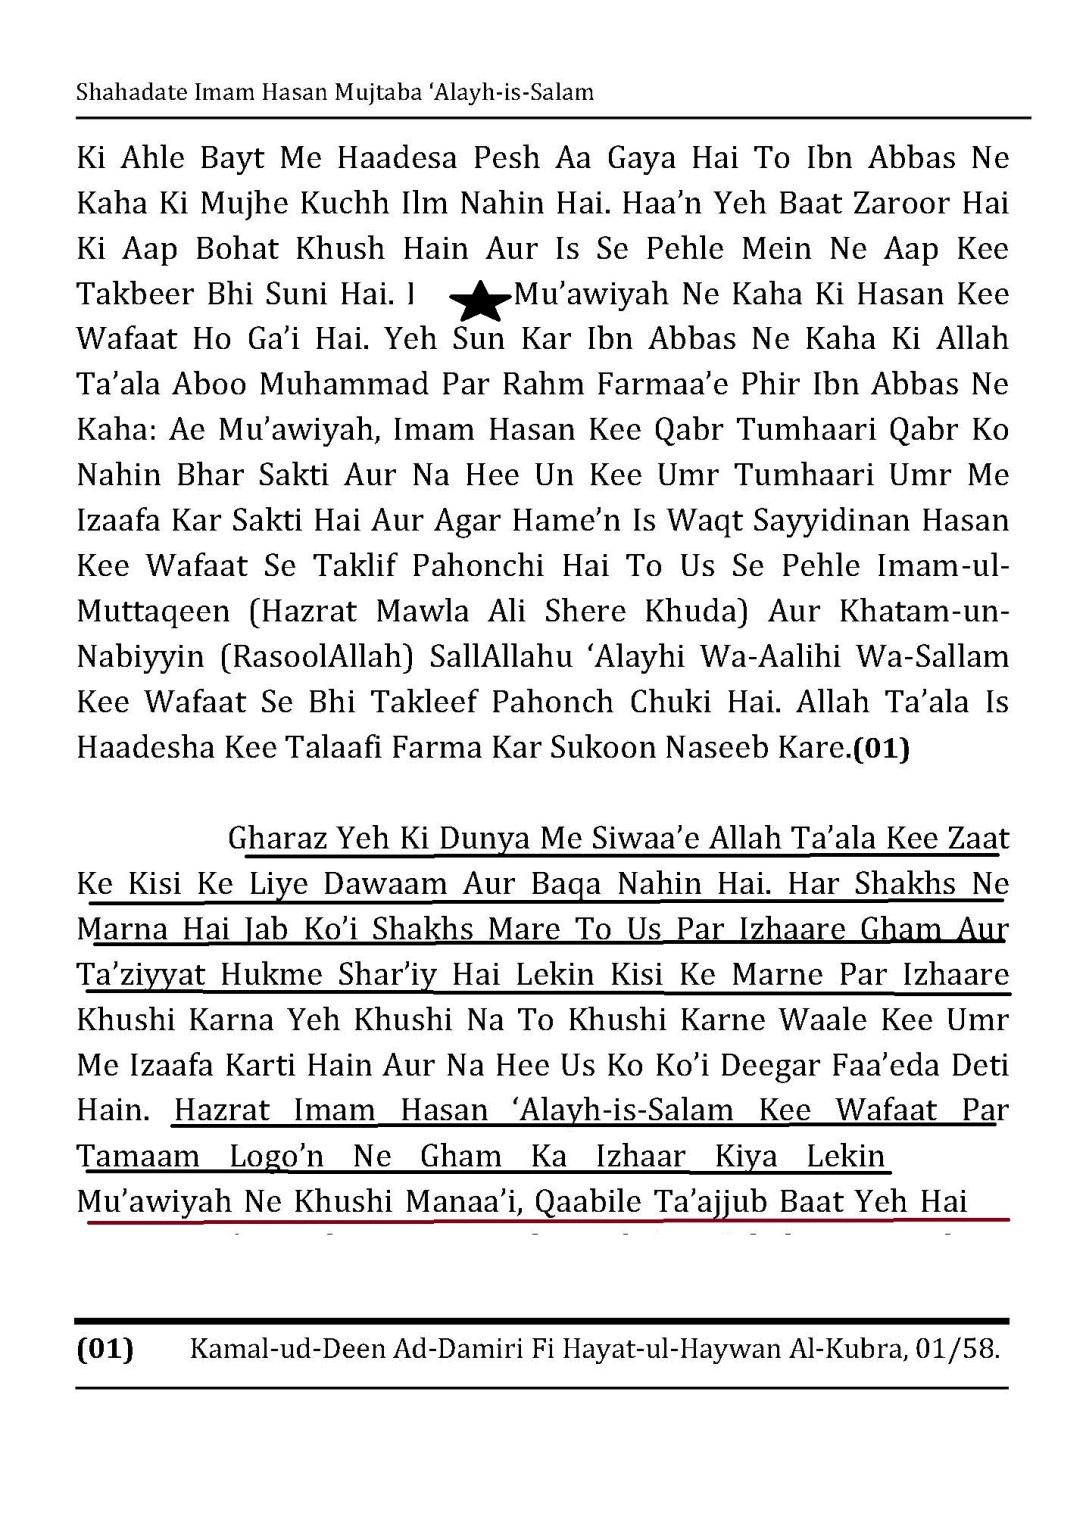 shahadate-imam-hasan-mujtaba-e28098alayh-is-salam-pdf_unlocked_Page_12